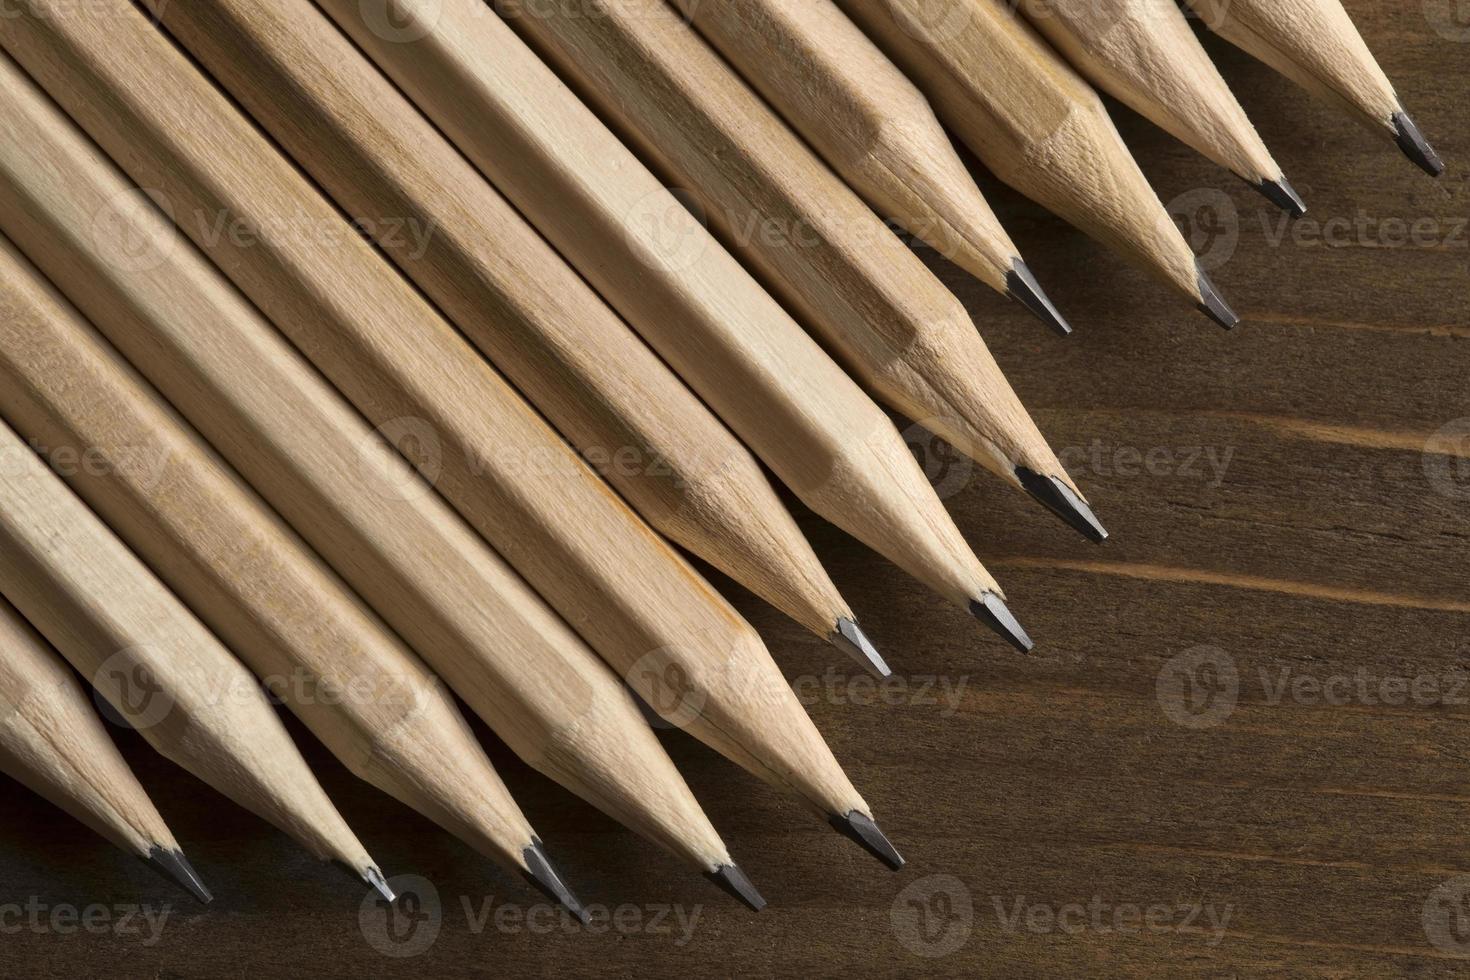 Graphite pencils photo